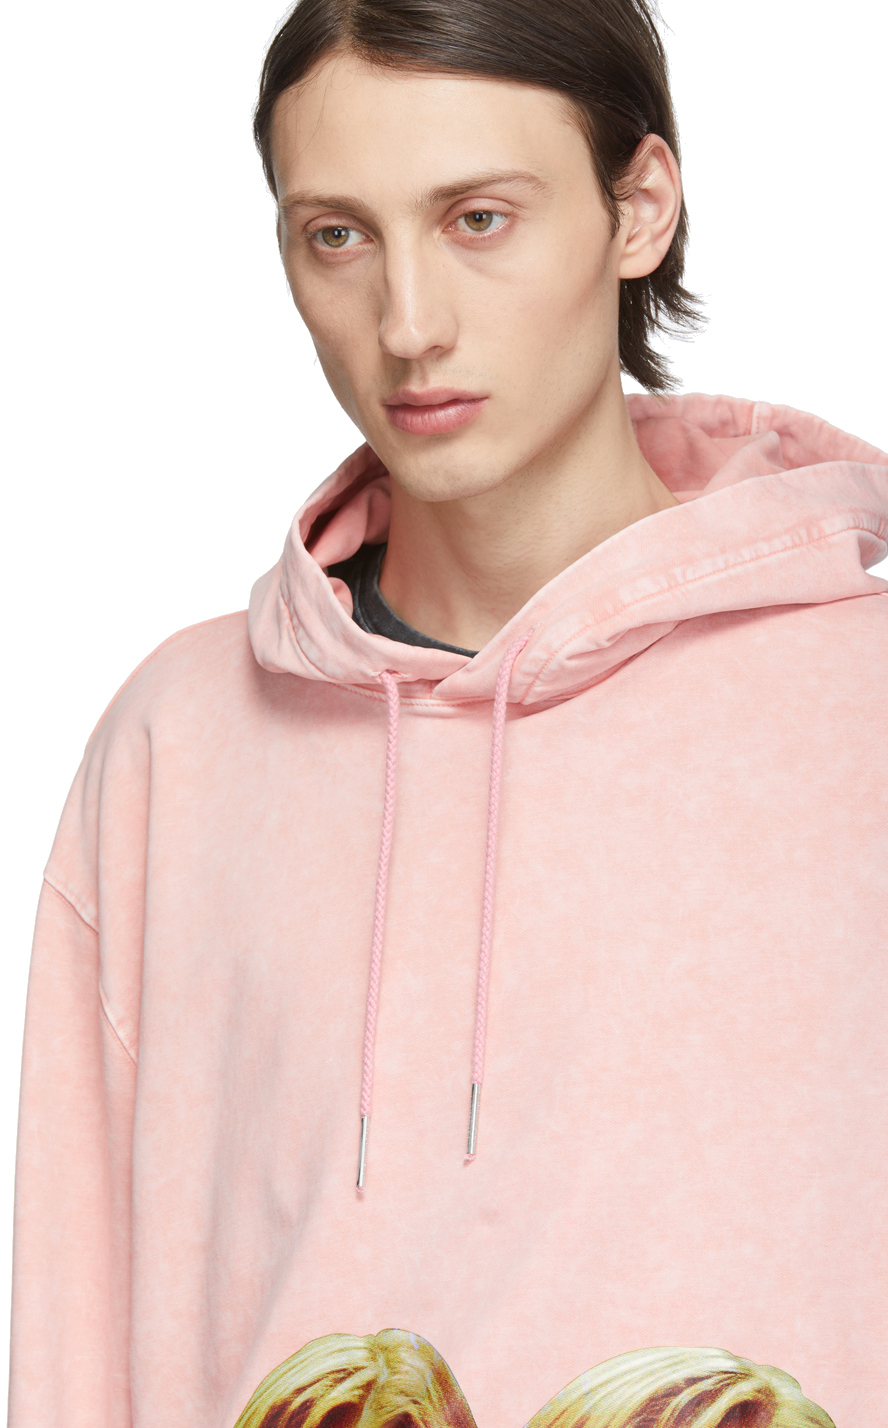 Rochambeau Accessories Pink Yves Scherer Edition Lohan Hoodie